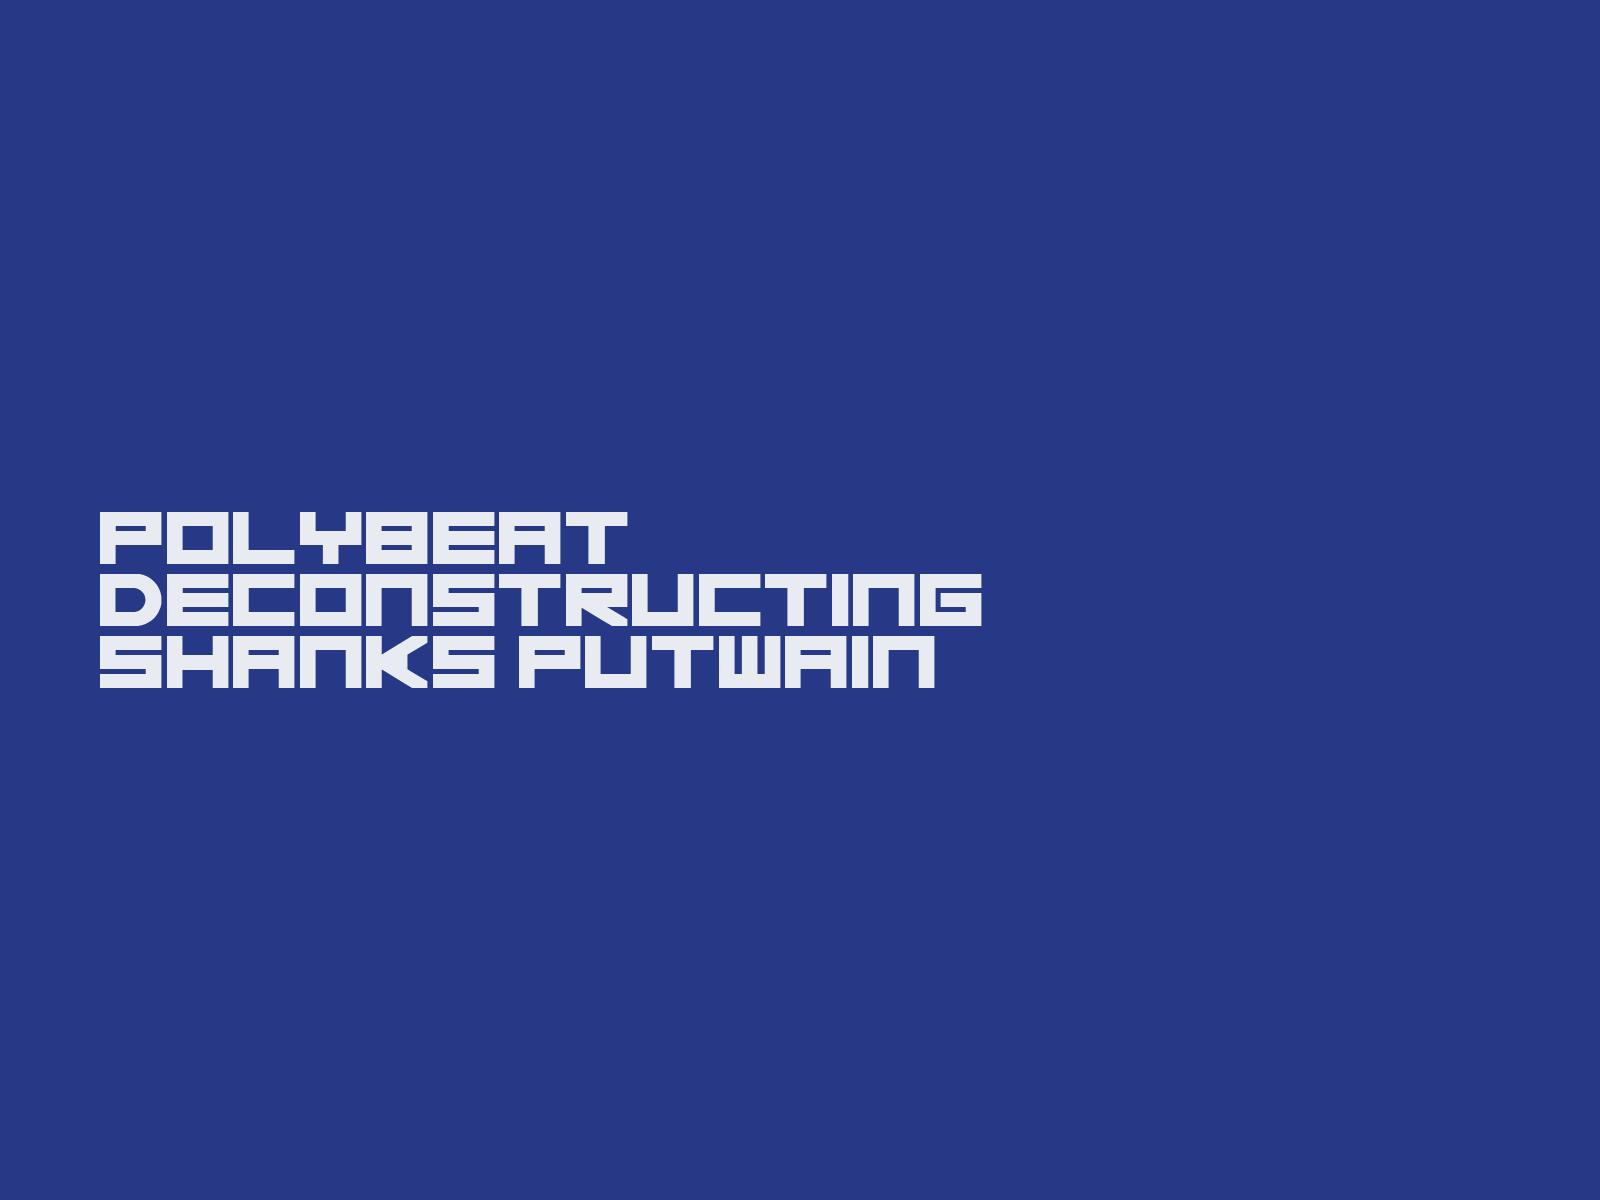 Polybeat - Deconstructing Shanks Putwain.jpg